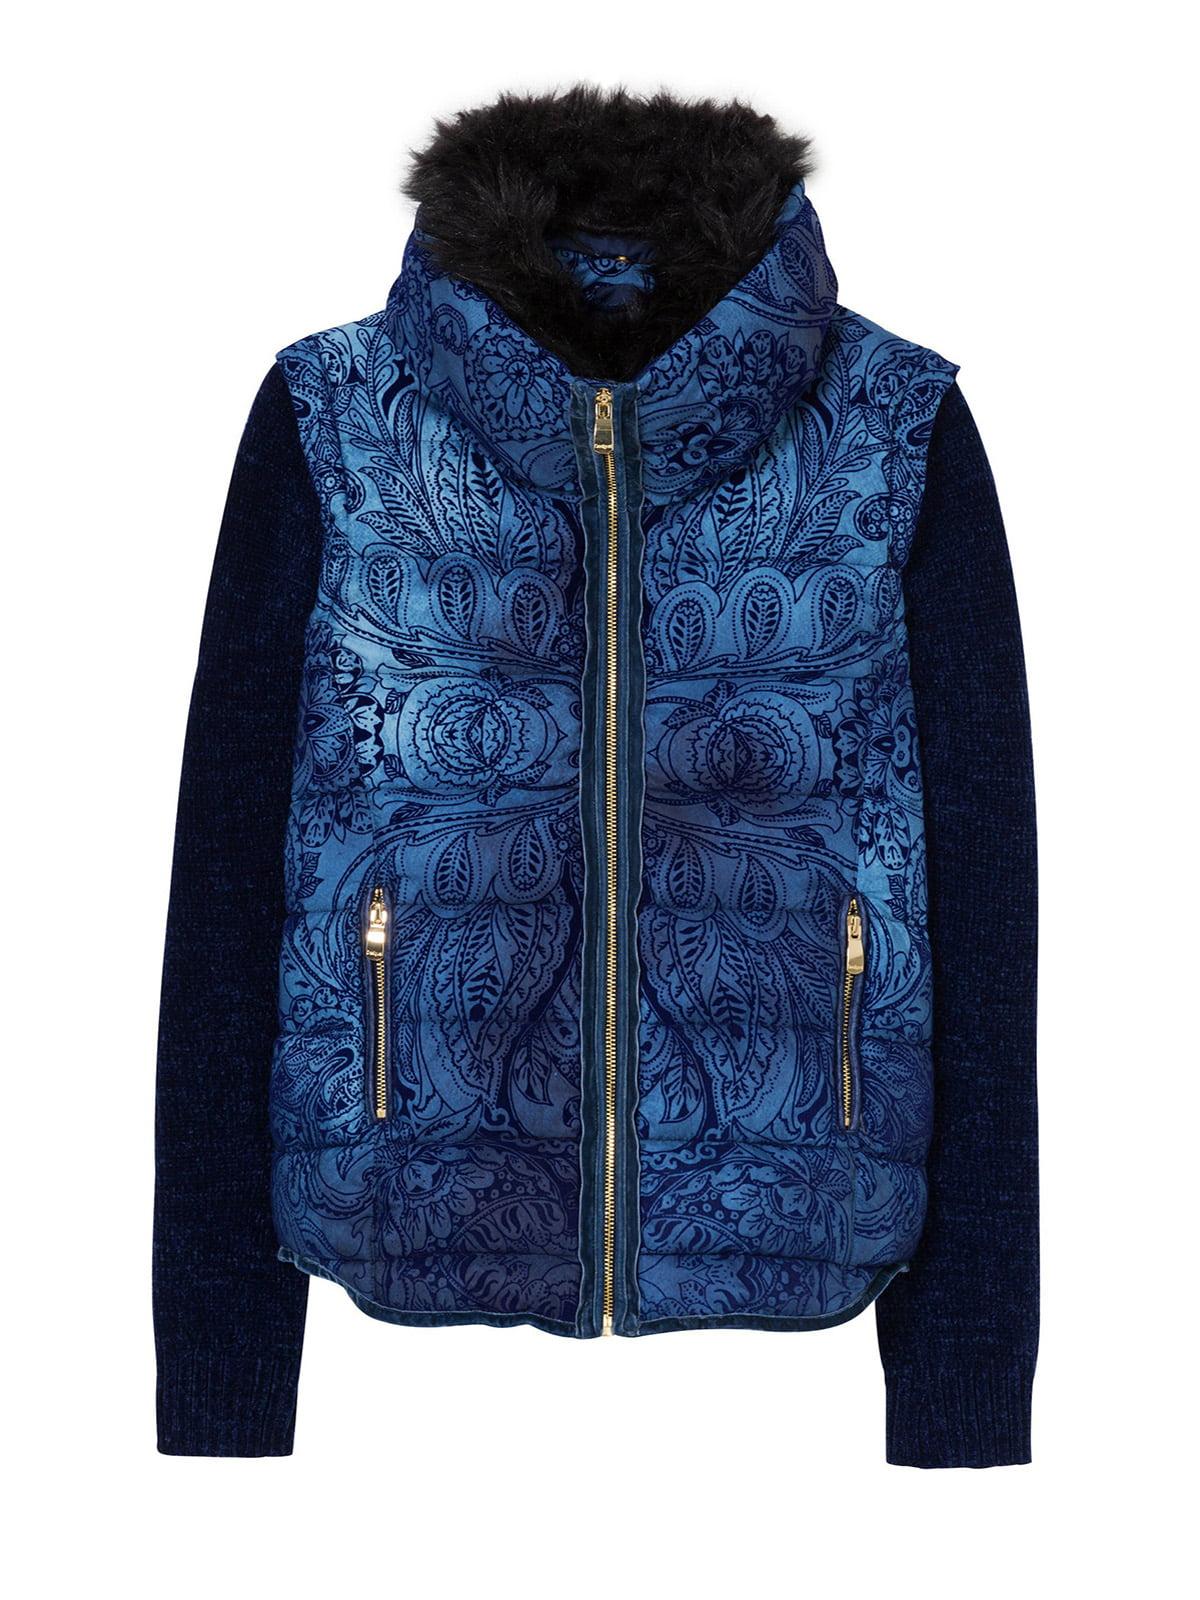 Куртка синя з принтом | 4524254 | фото 5